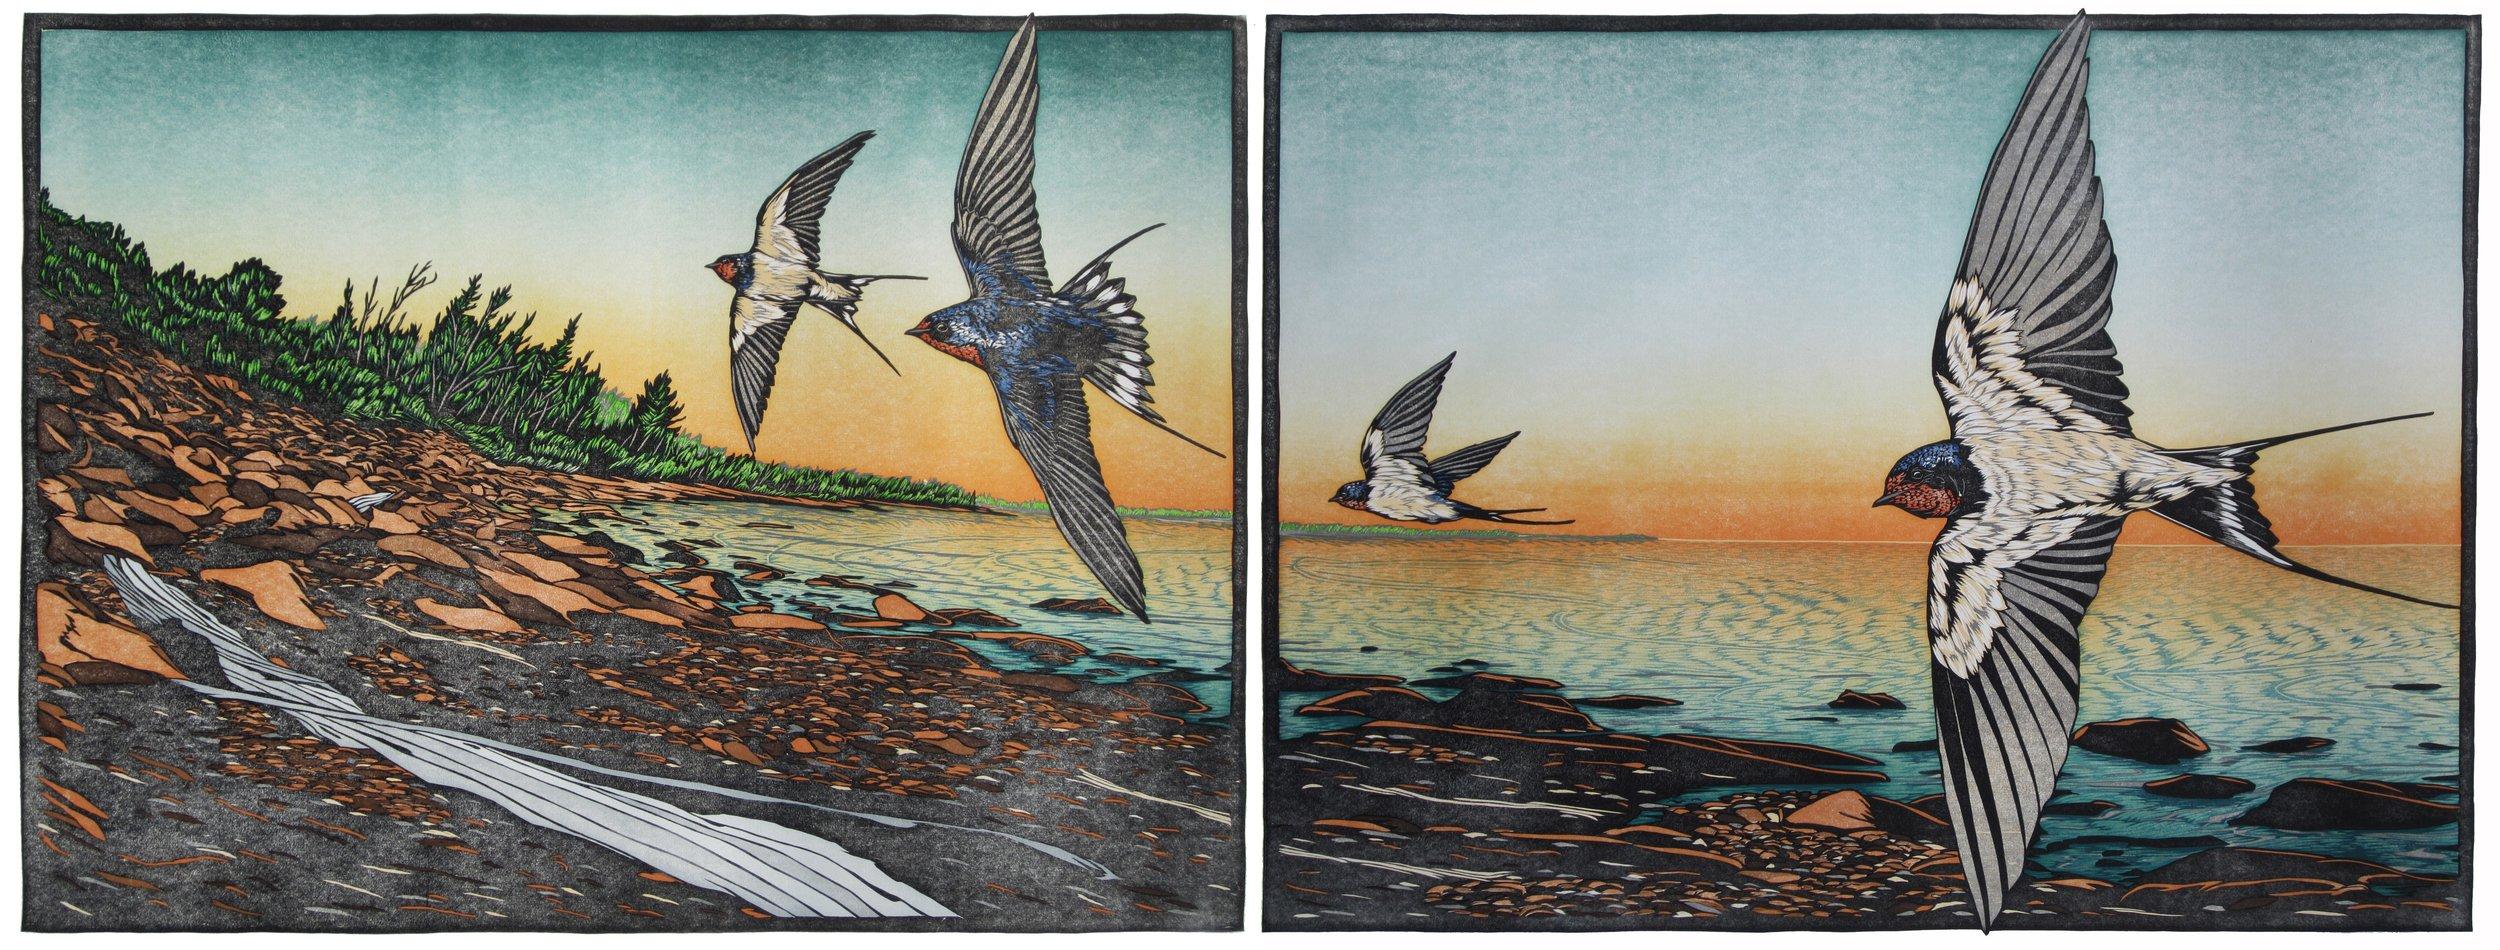 Nick Wroblewski - Draw of the Lake Diptych